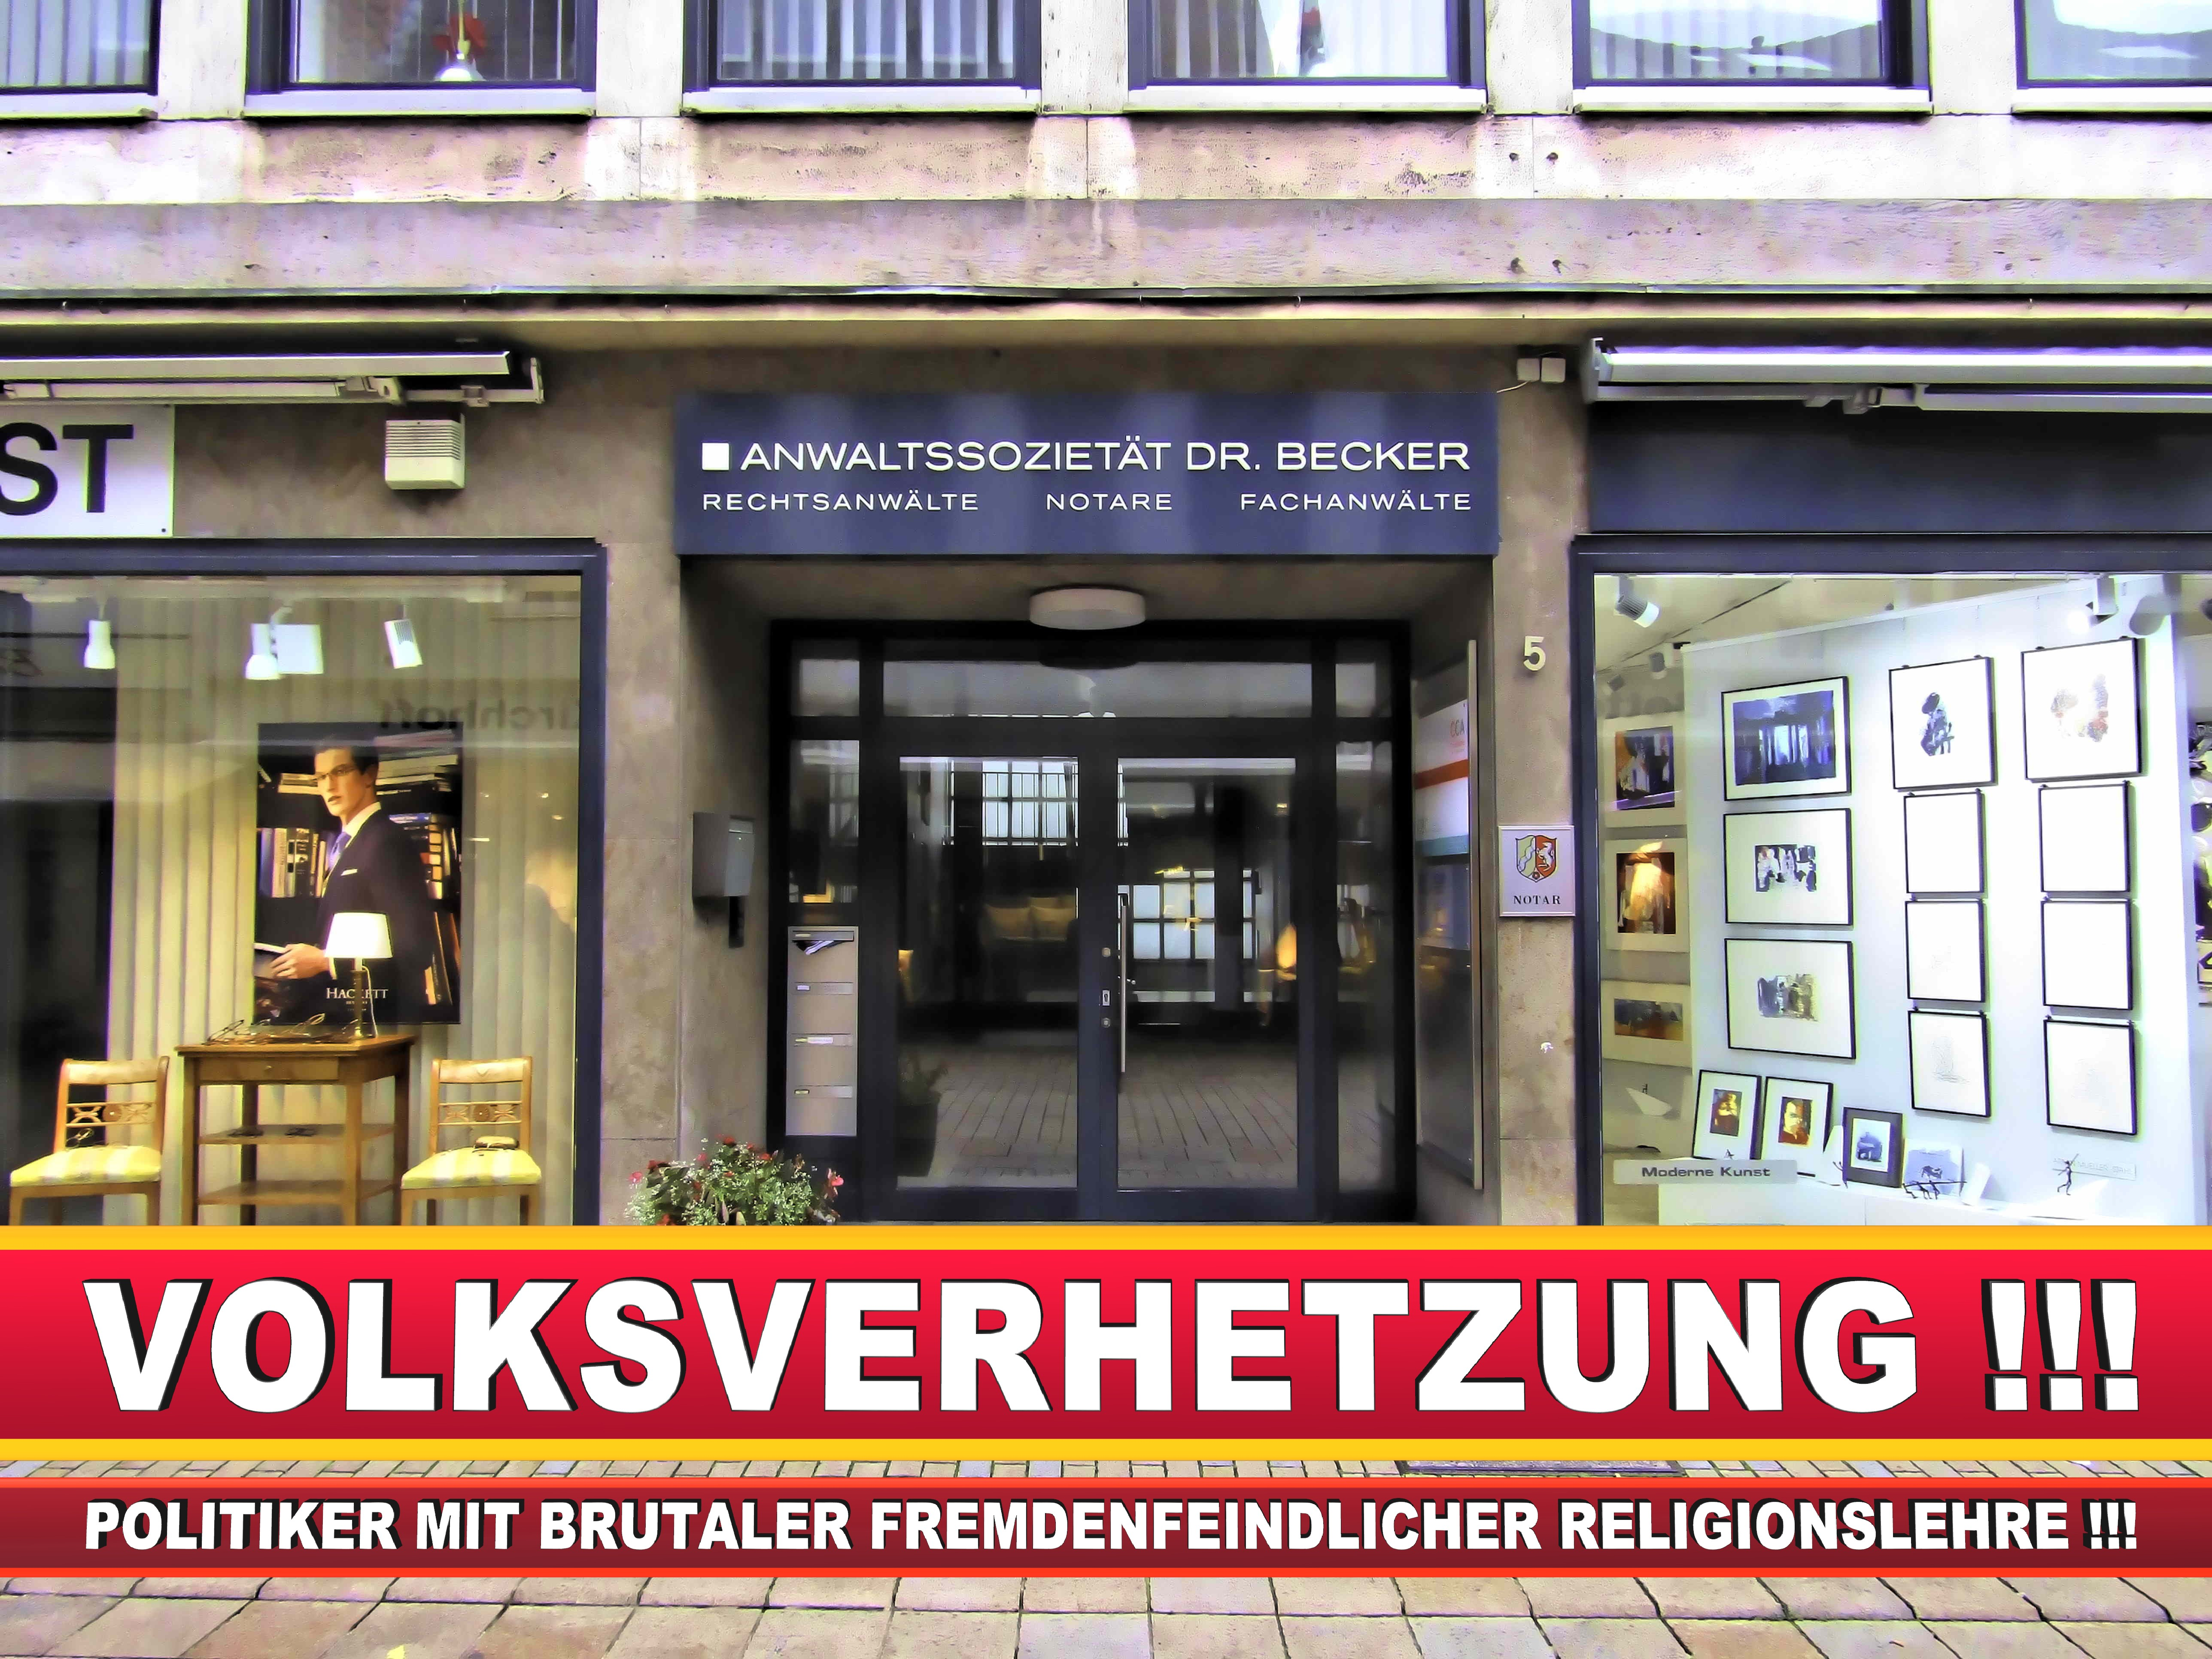 RECHTSANWALT DR THORSTEN FELDMANN CDU BIELEFELD RECHTSANWALT UND NOTAR A D WERNER KAUP LANDTAGSWAHL BUNDESTAGSWA L BÜRGERMEISTER AHL NRW (1)